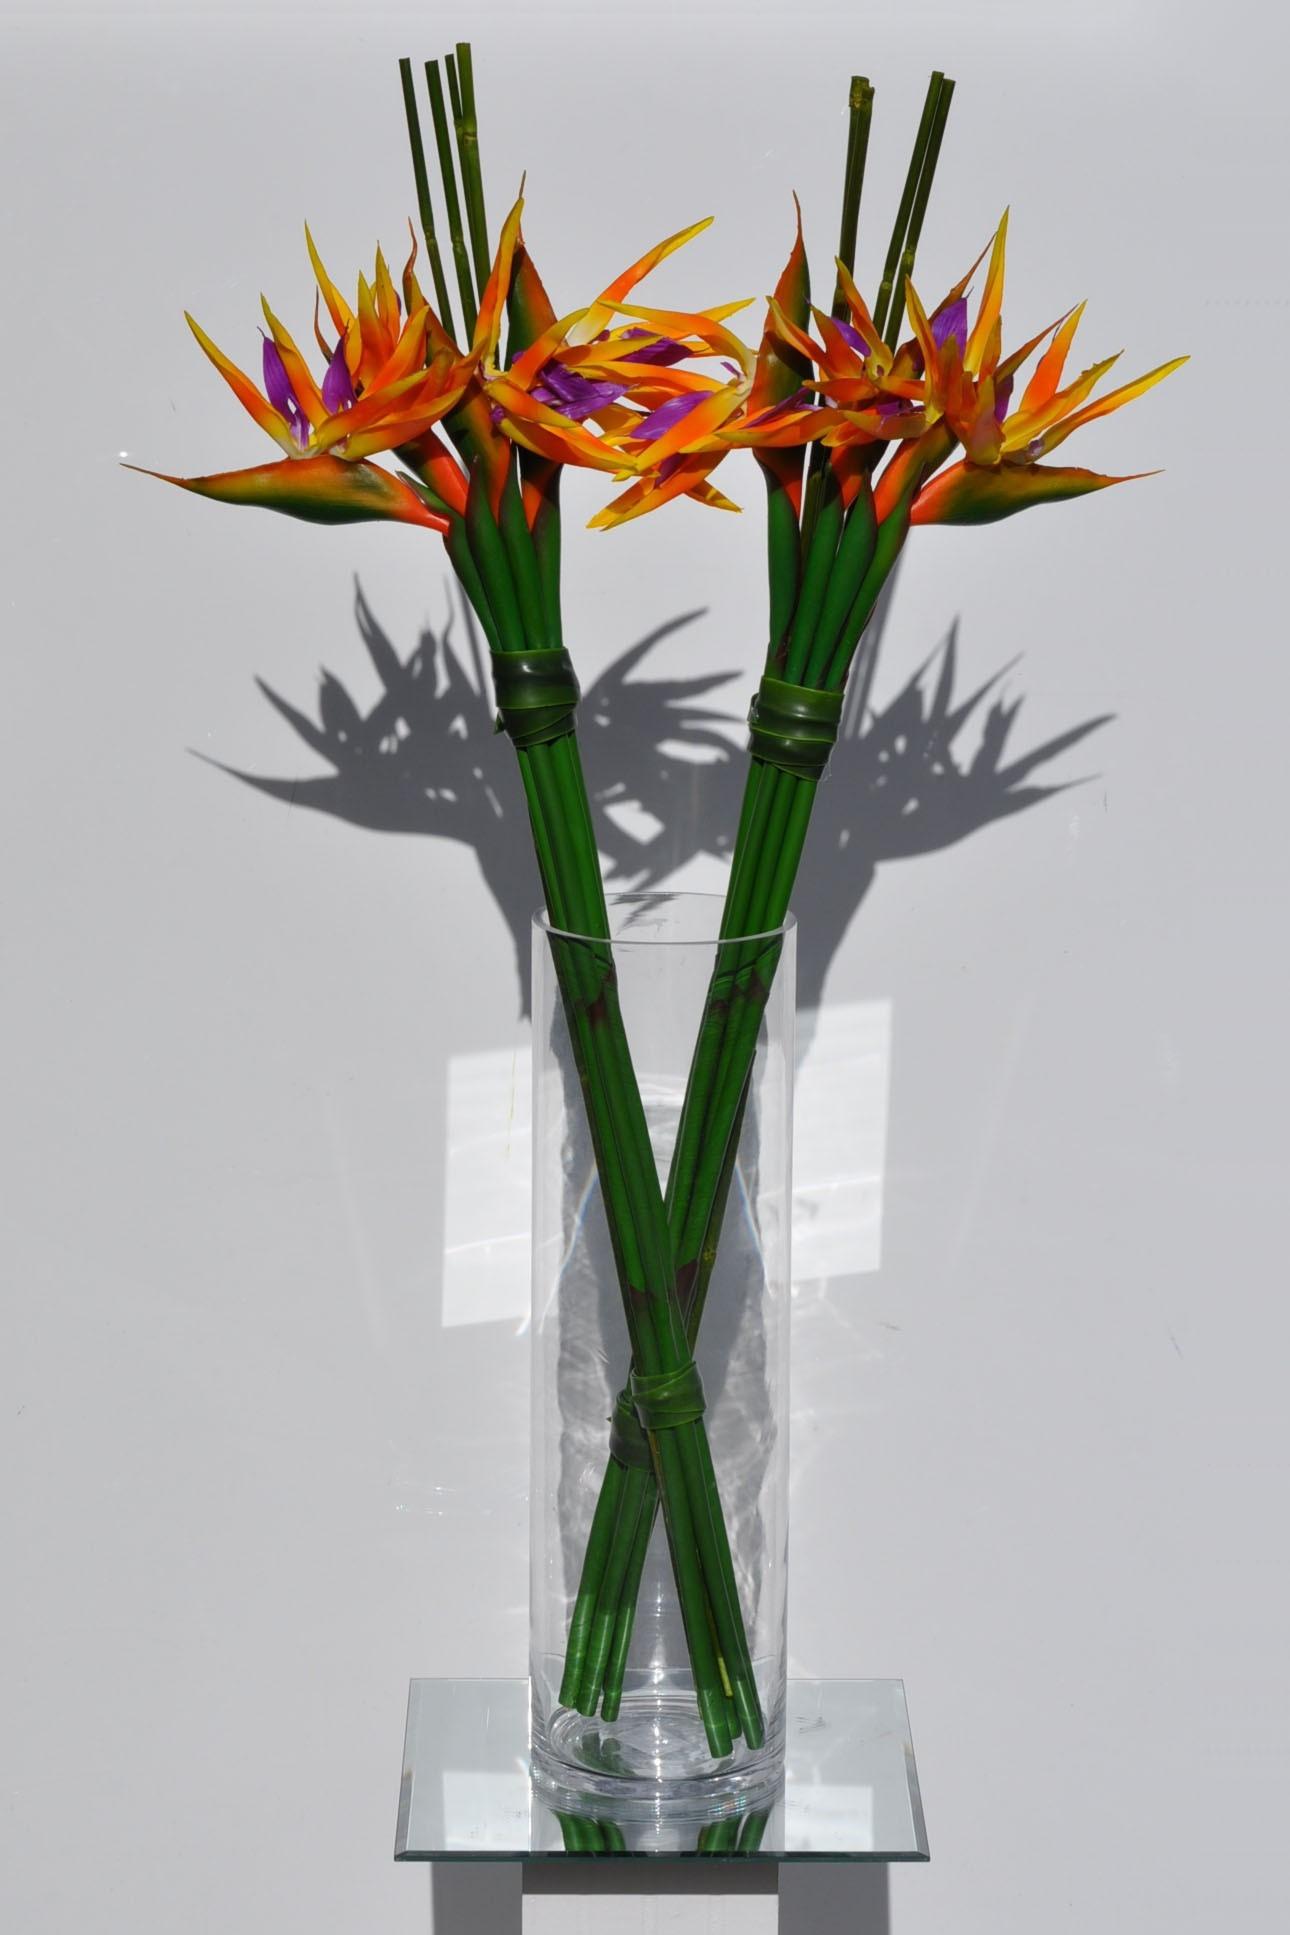 mackenzie childs vase of 27 beautiful flower arrangements small flower decoration ideas within flower arrangements small beautiful vase part 306